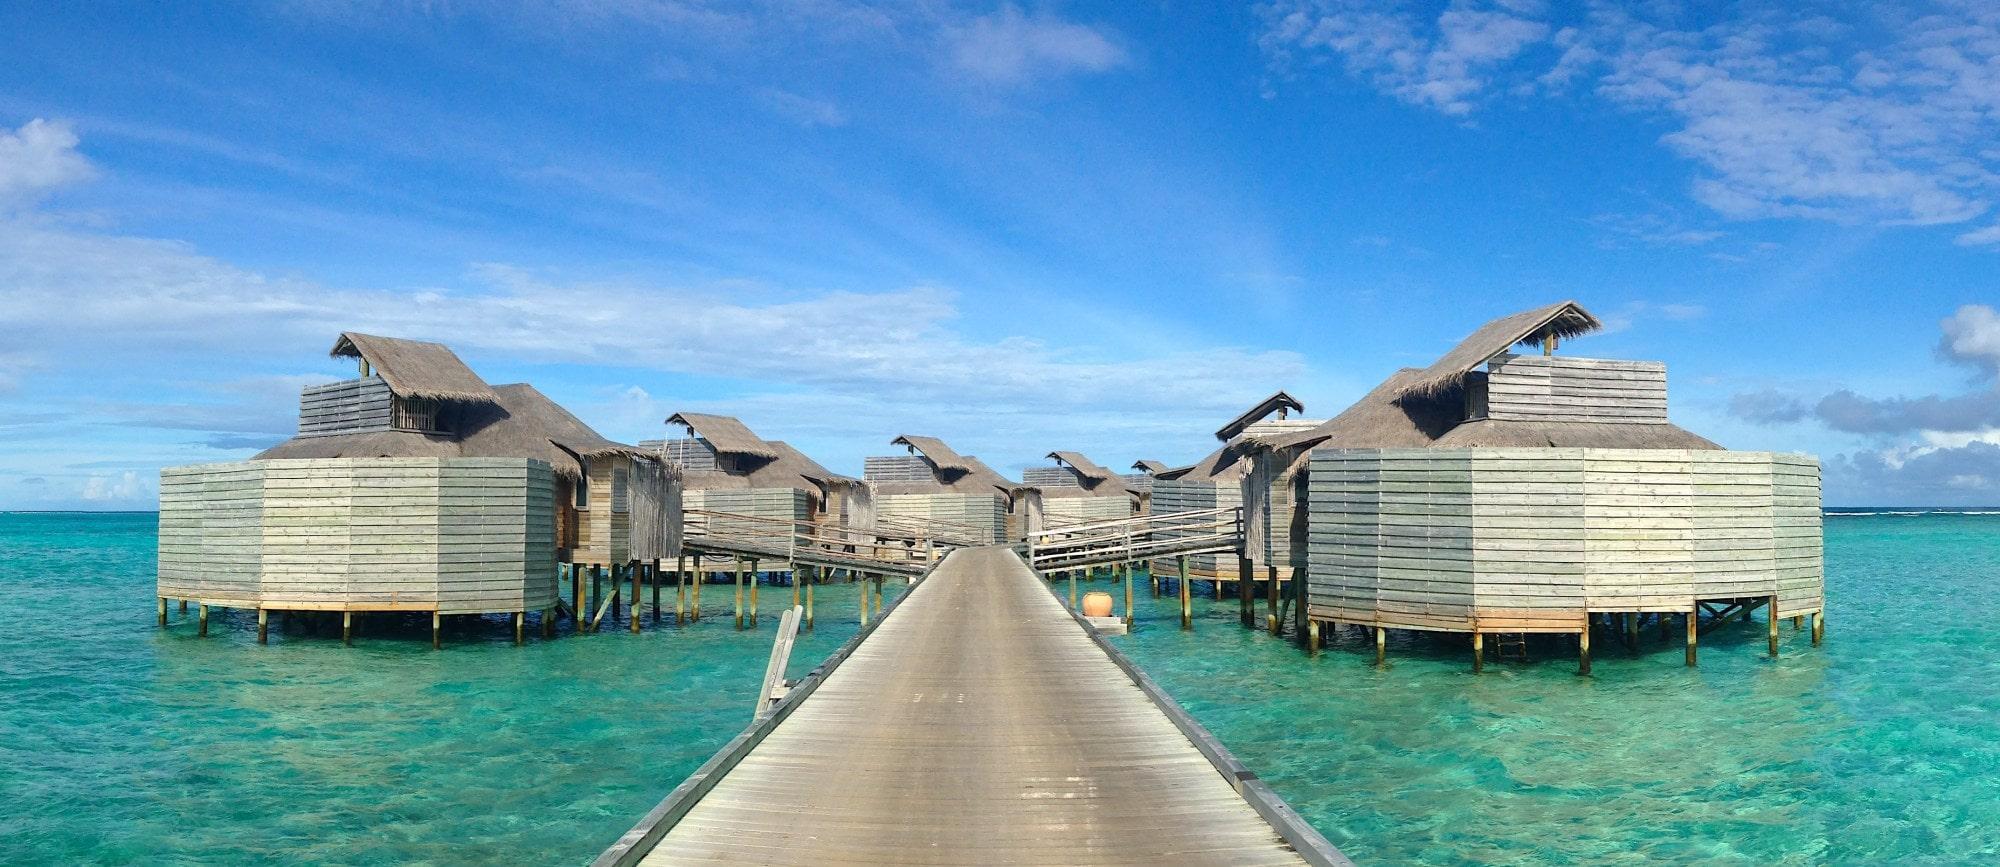 My first trip to the Maldives at Six Senses Laamu